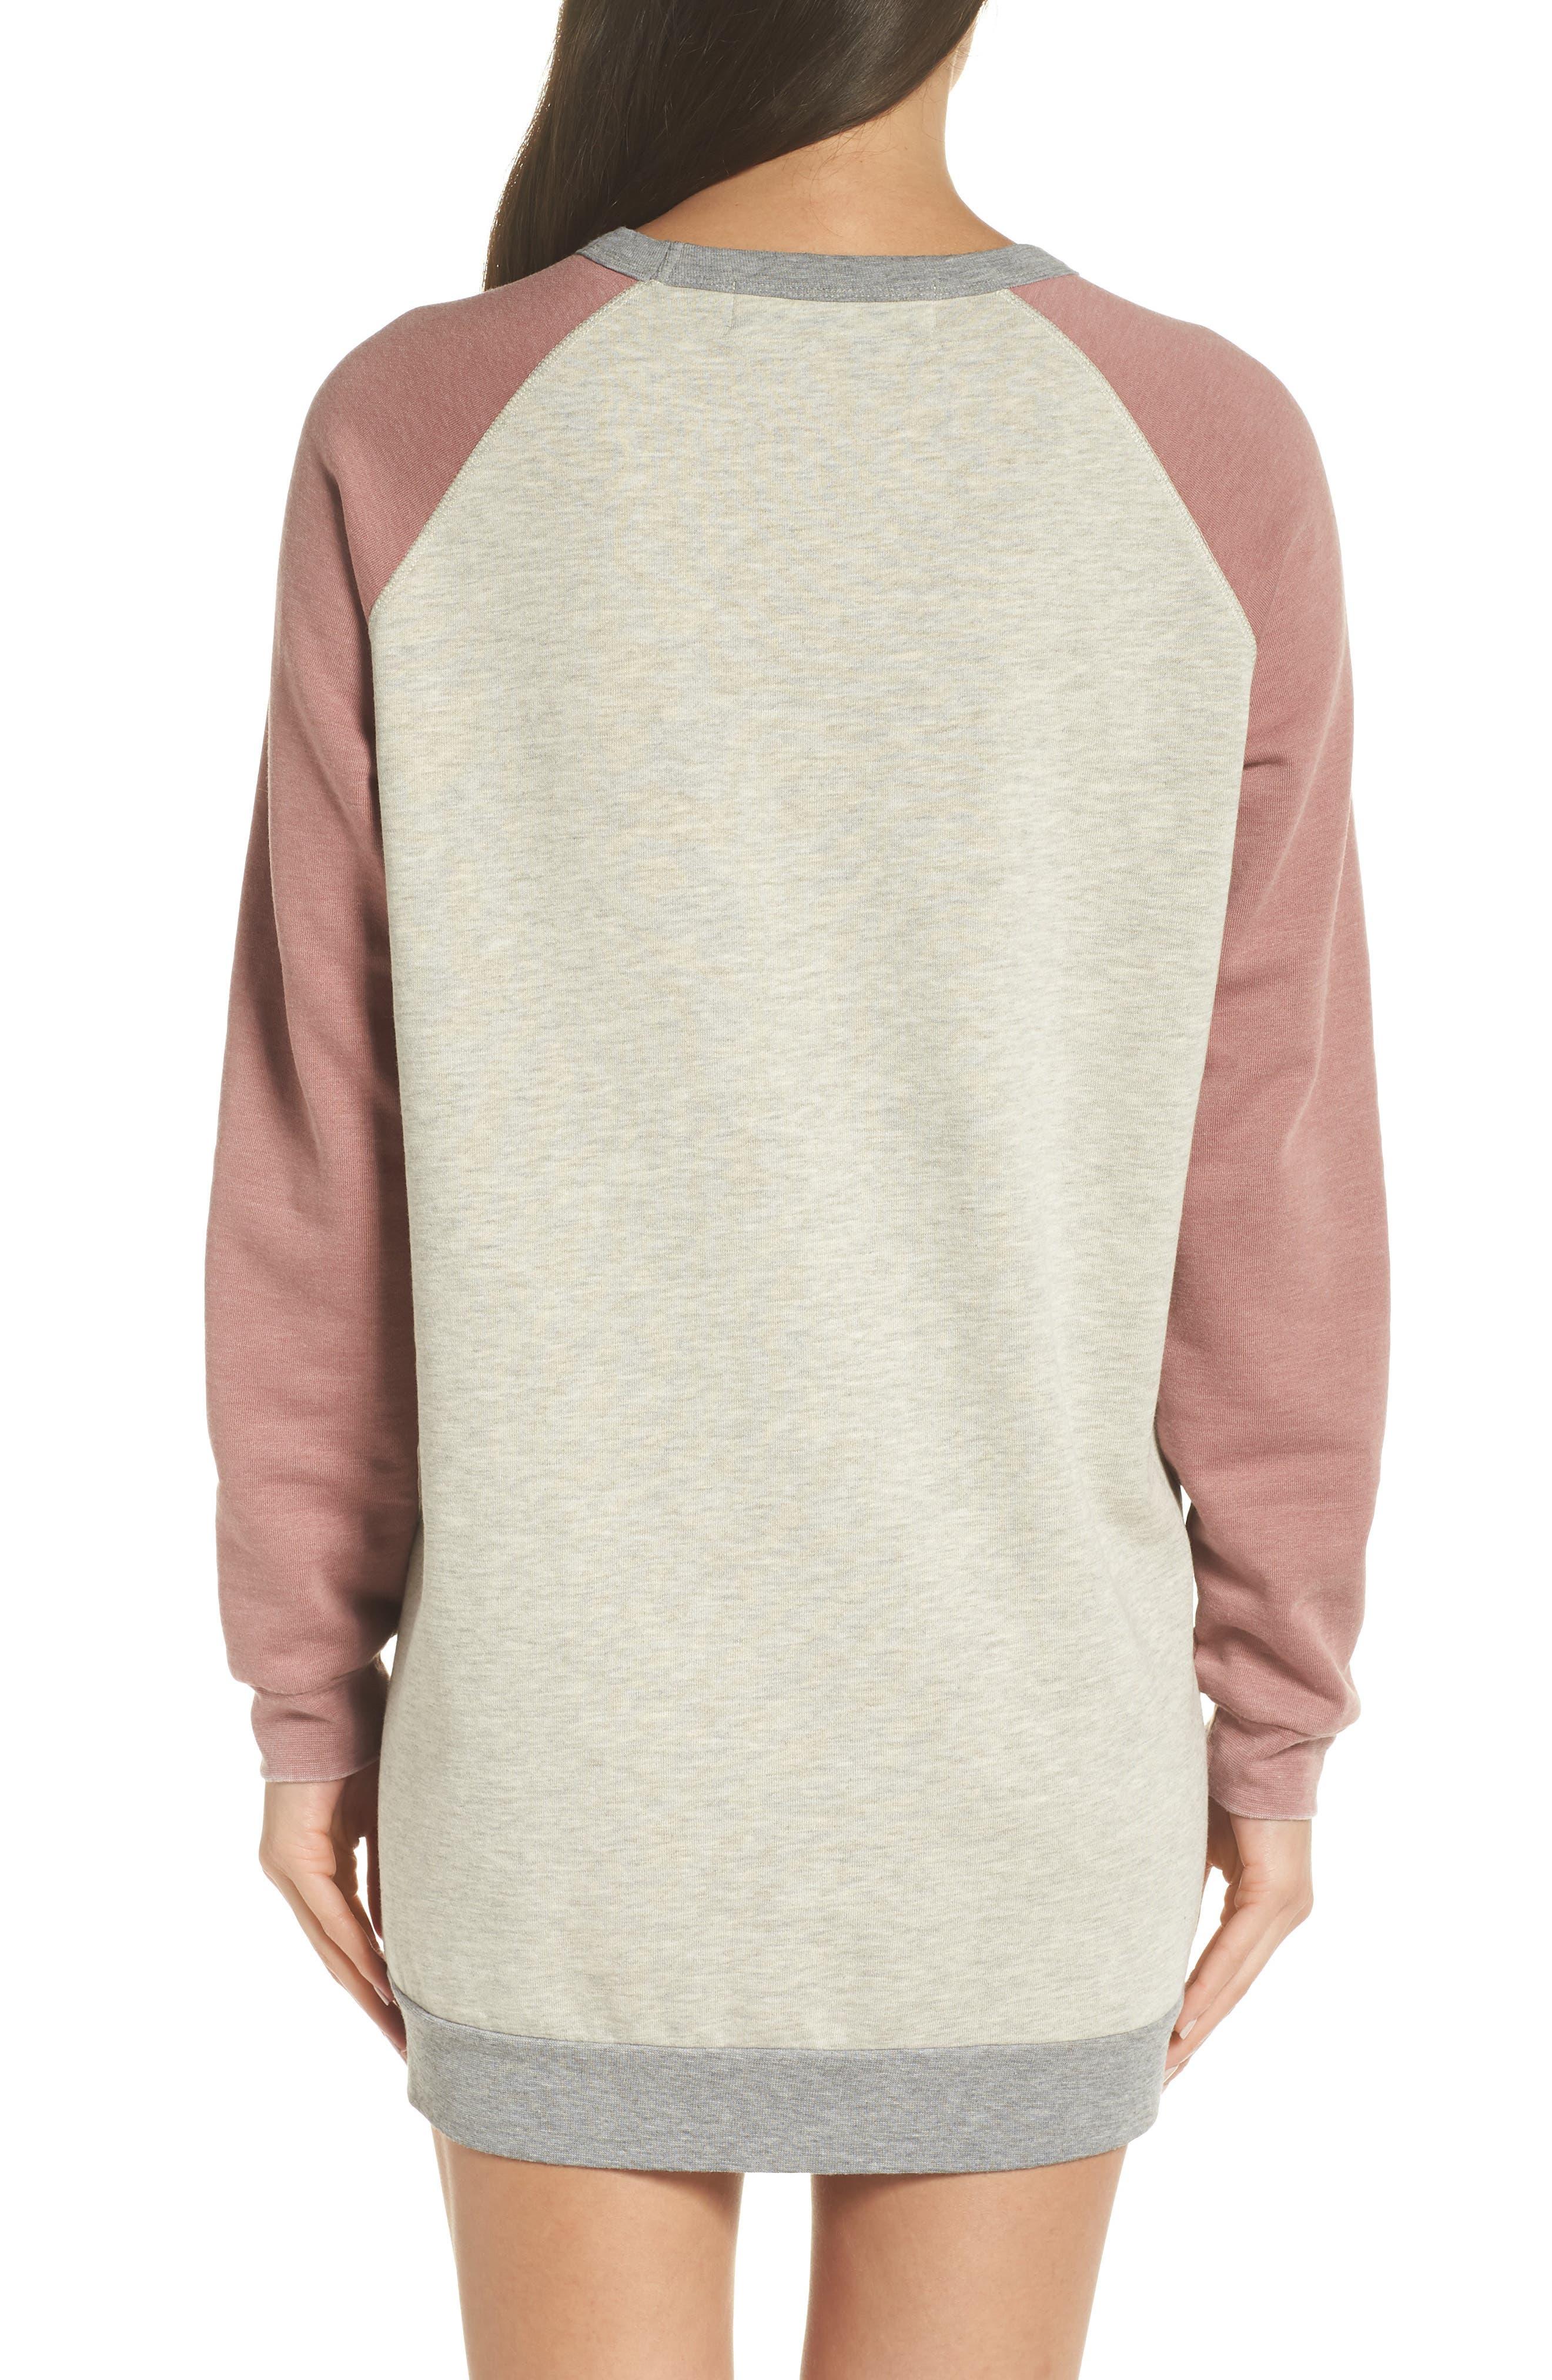 Lounge Sweatshirt Dress,                             Alternate thumbnail 2, color,                             PEBBLE HEATHER / MAUVE